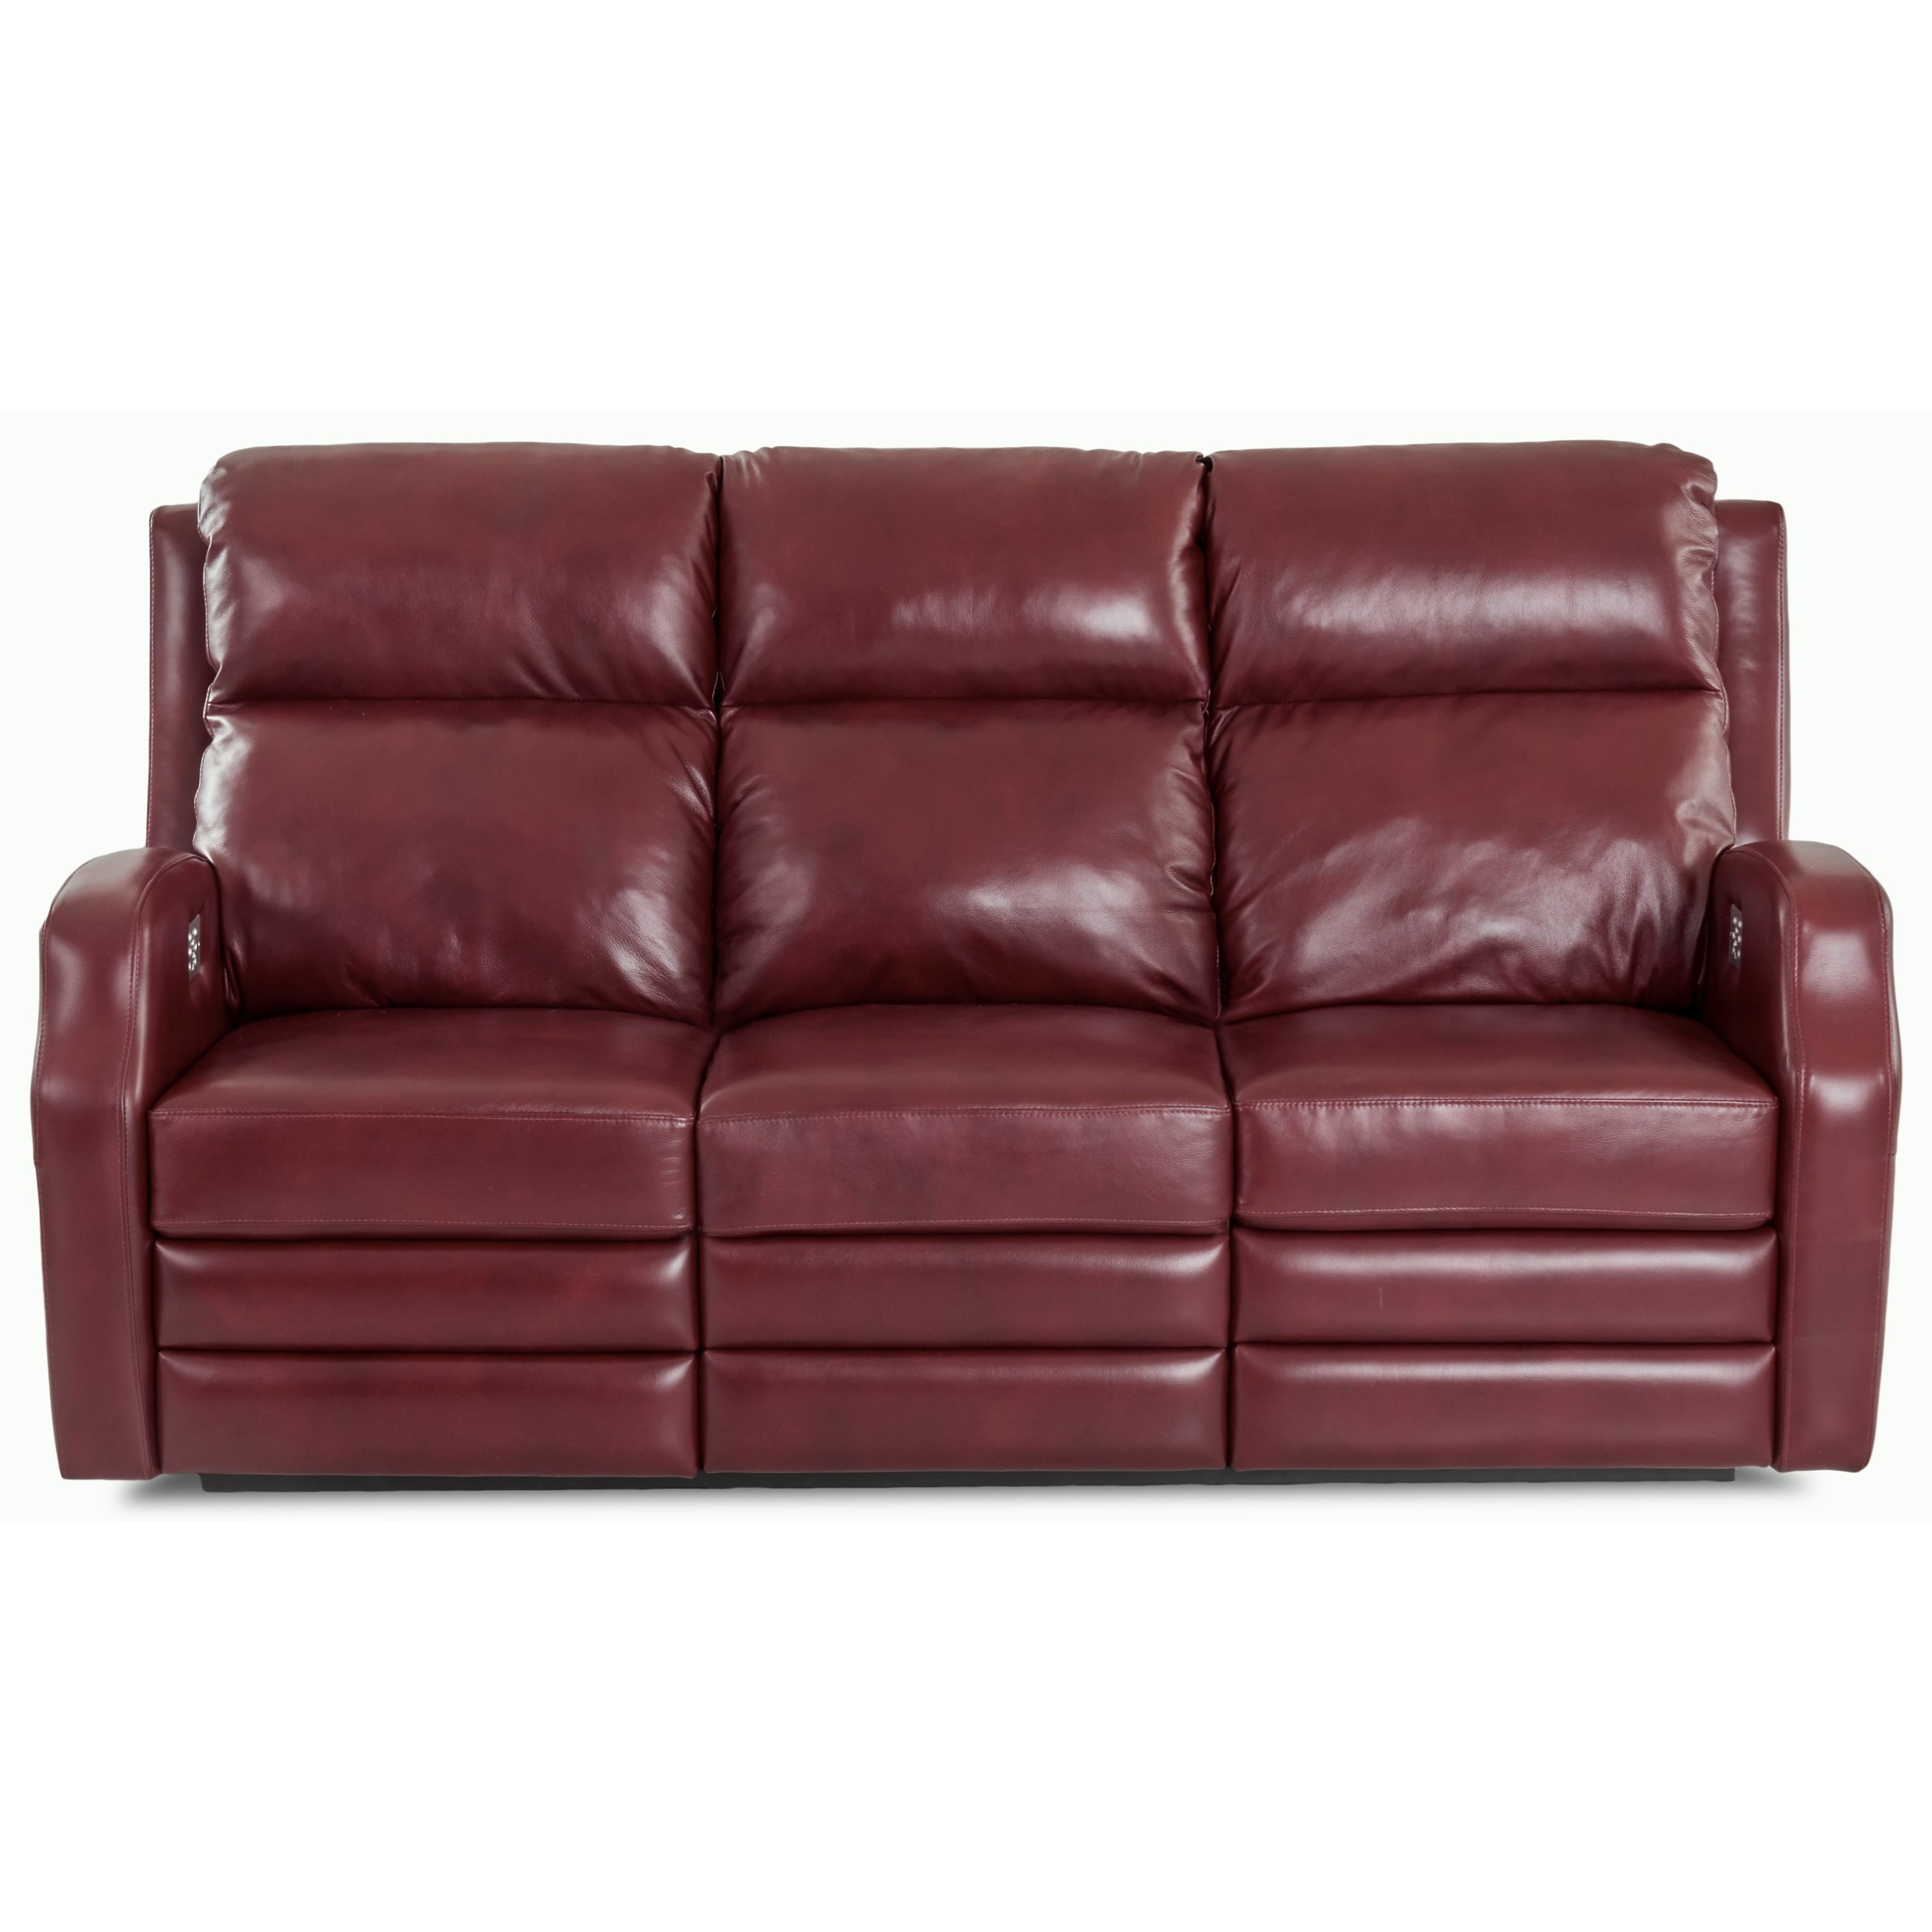 Kamiah Power Reclining Sofa w/ Pwr Head/Lumbar by Klaussner at Lapeer Furniture & Mattress Center